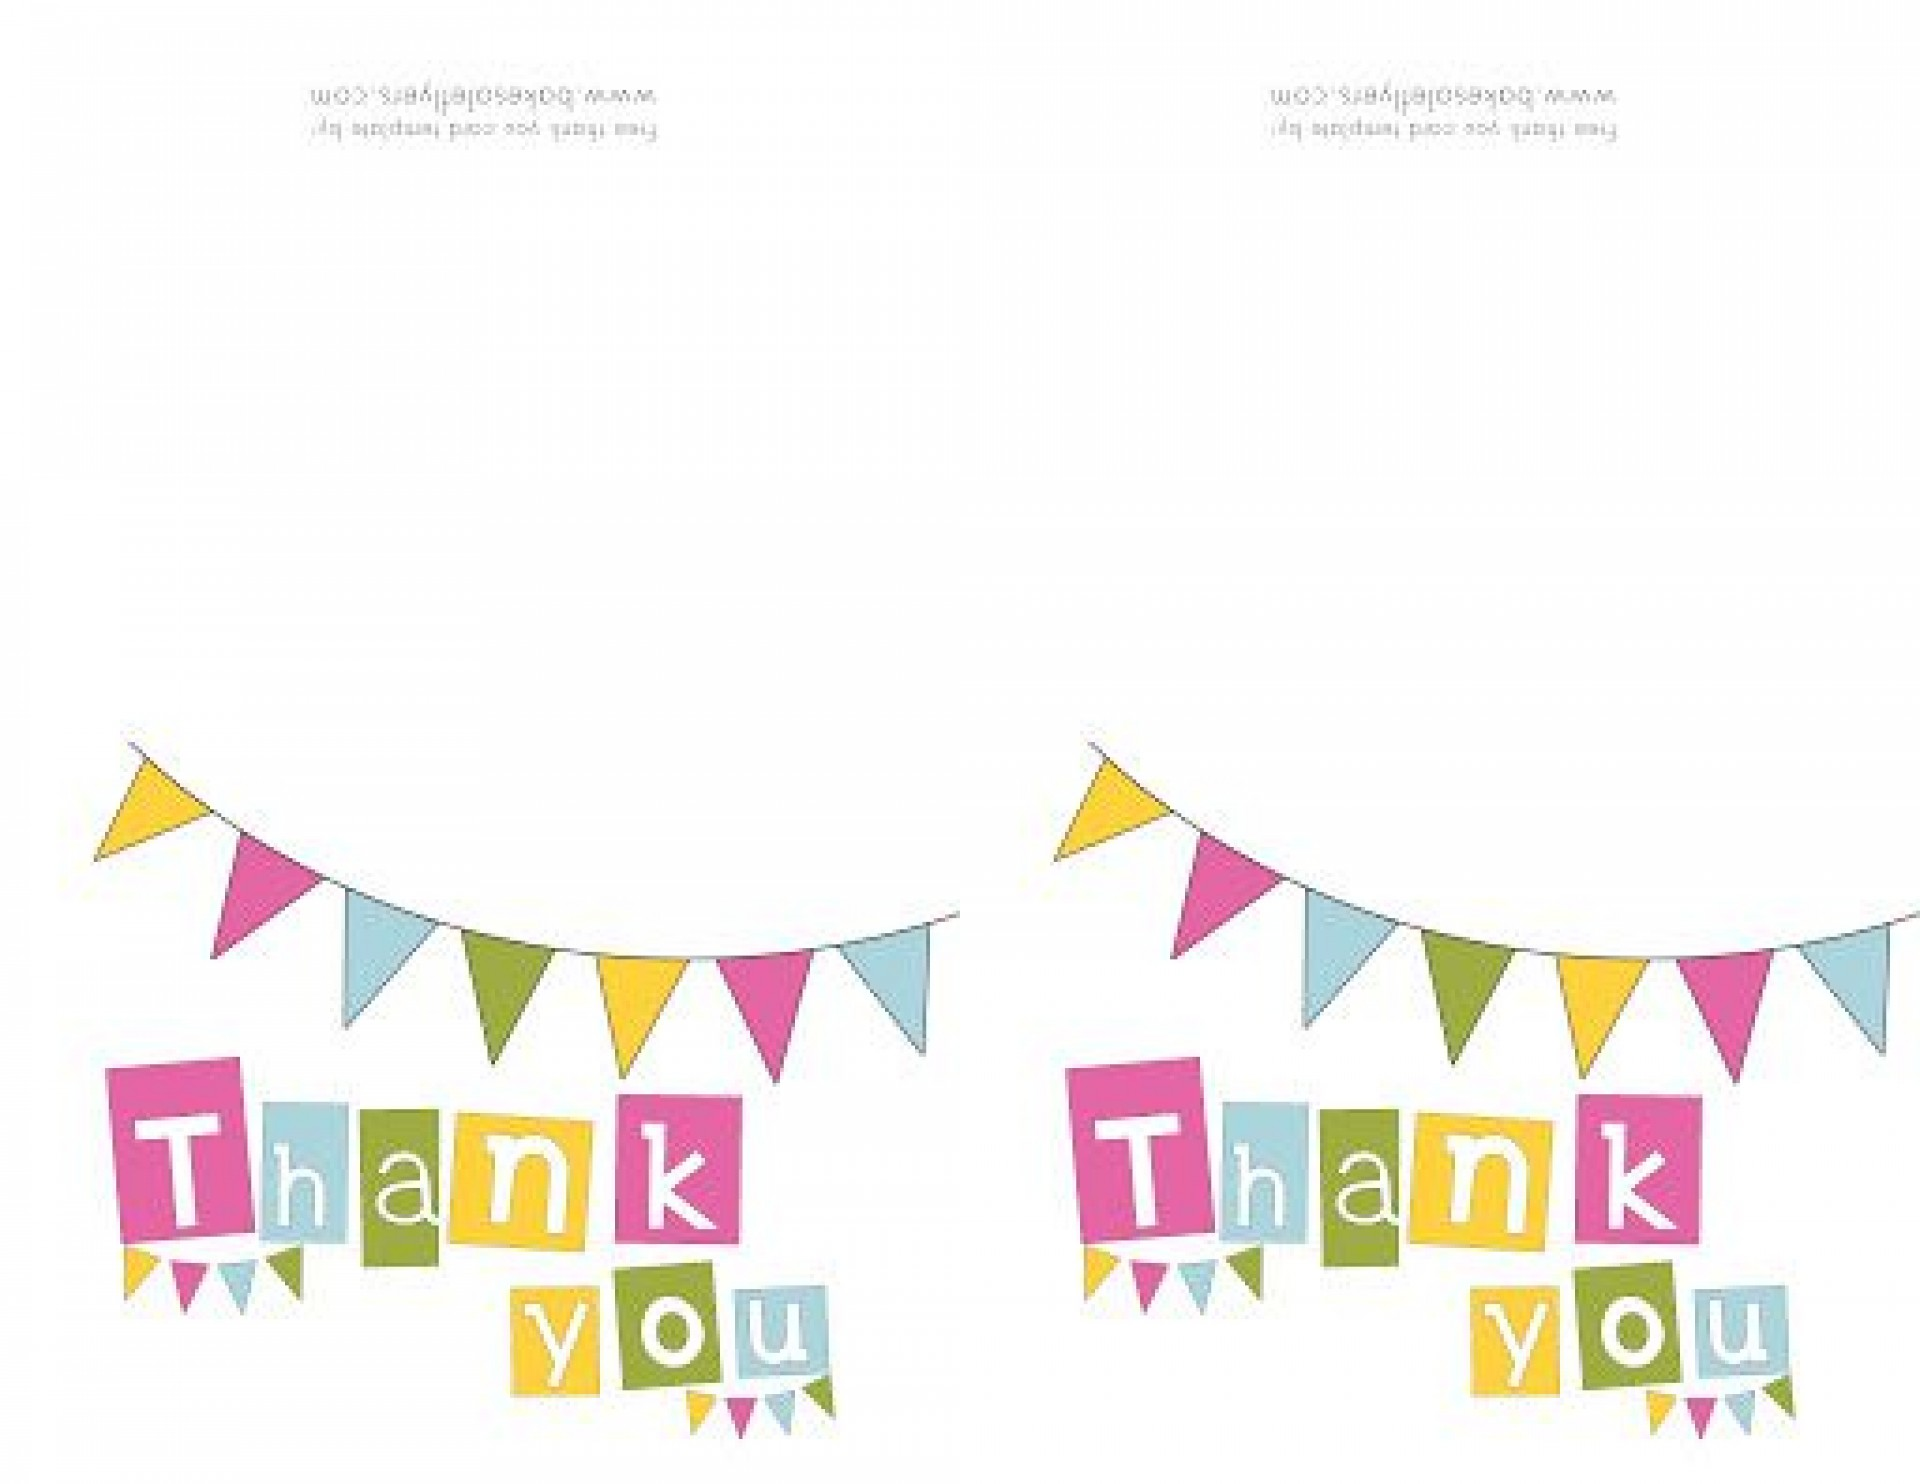 009 Beautiful Thank You Note Template Free Highest Quality  Poshmark Christma Teacher1920